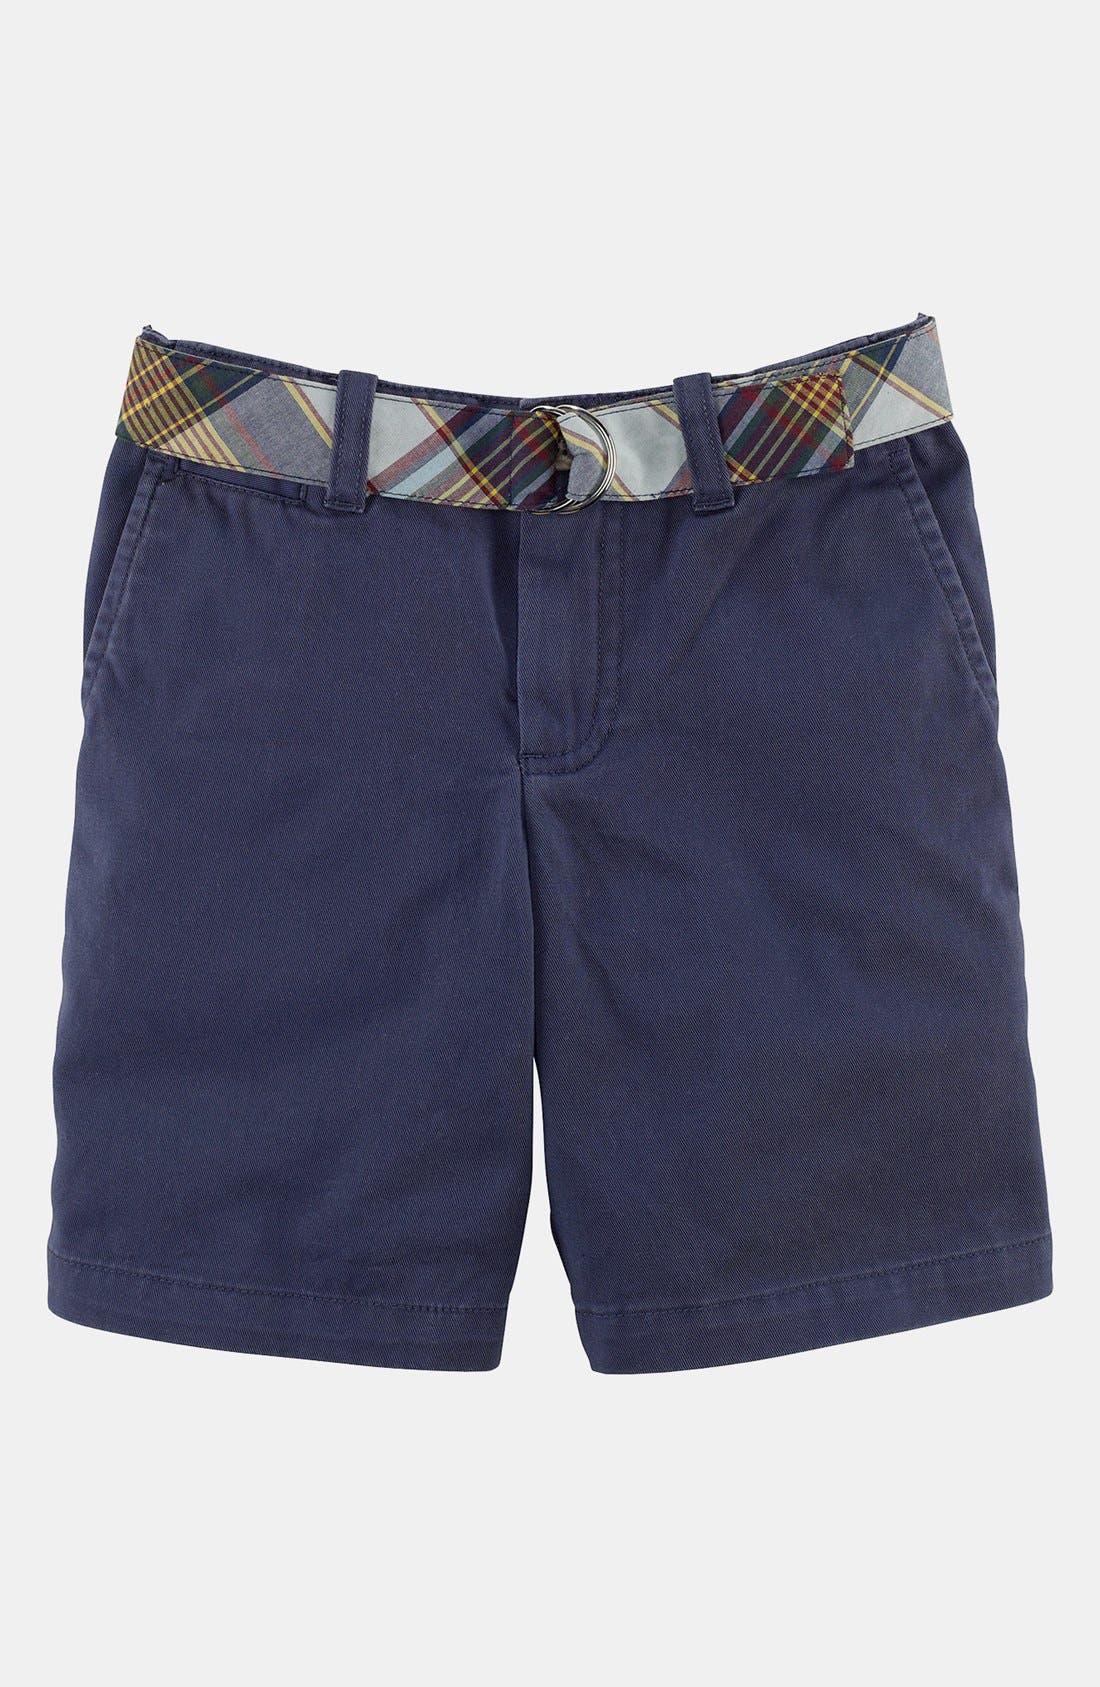 Alternate Image 1 Selected - Ralph Lauren 'Bleecker' Shorts (Toddler Boys)